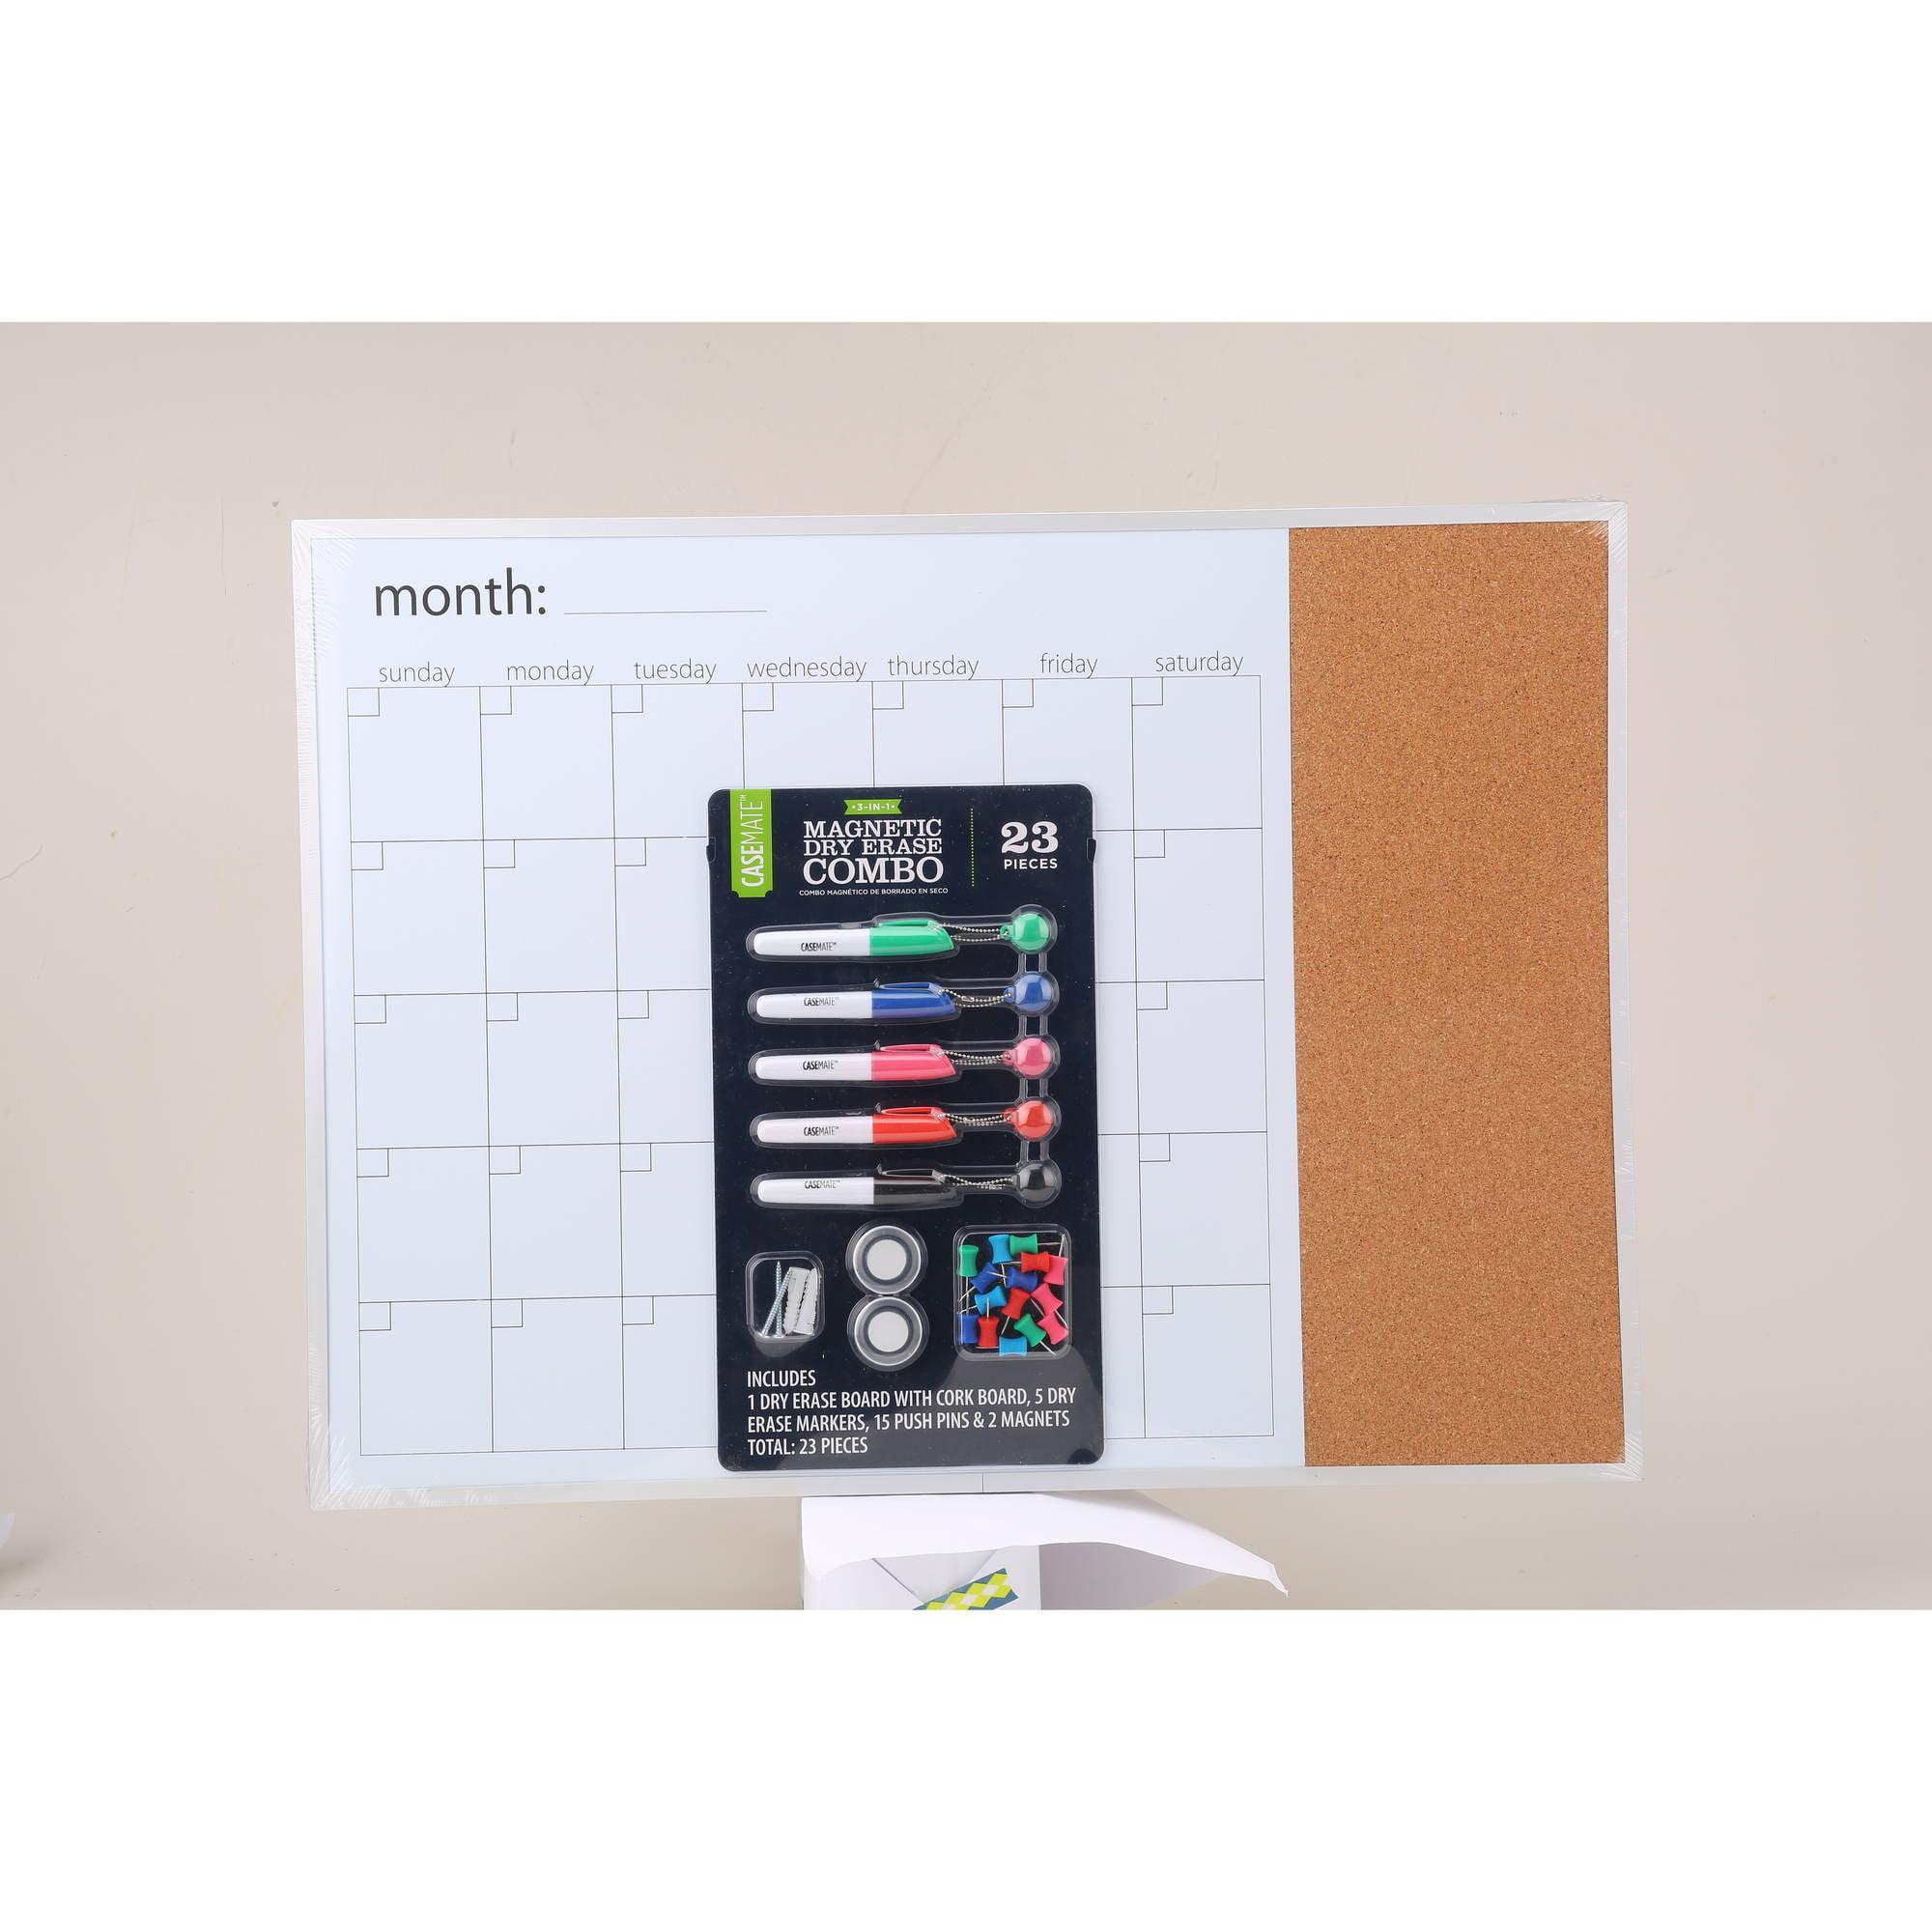 Chalkboard Calendar Walmart : Dry erase calendar with cork board pixshark